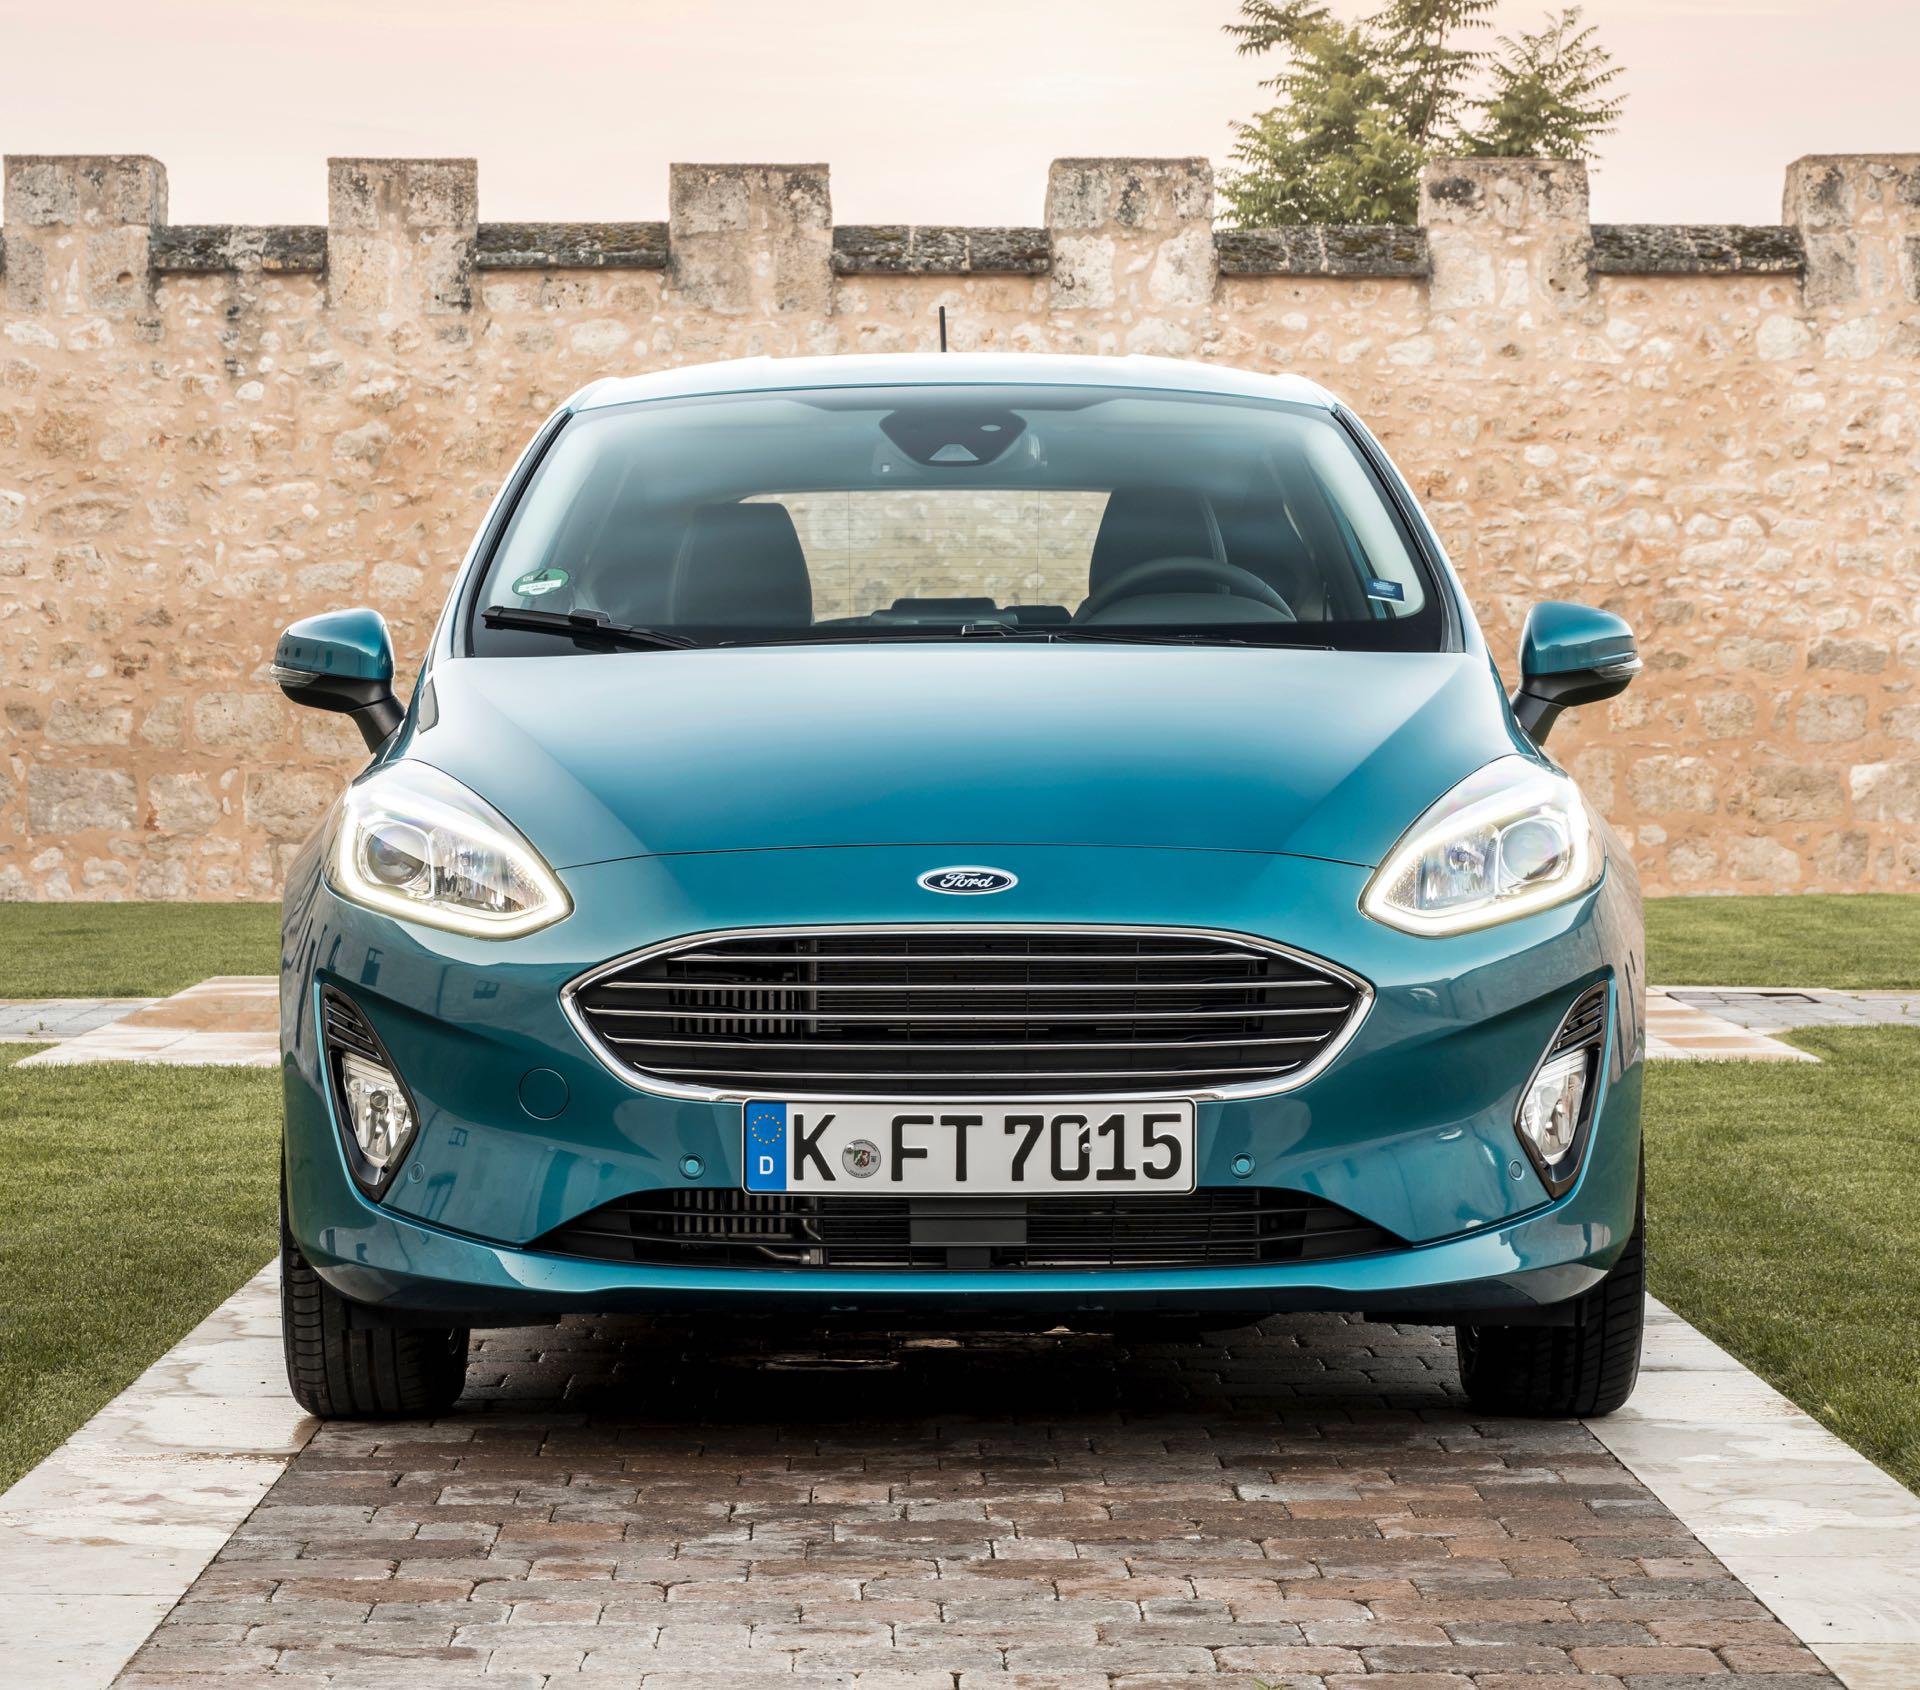 ford ka 2017 with Prova Ford Fiesta 2018 on Ford Ka Oficjalnie W Europie likewise Teste Chery Qq Flex O Carro Mais Barato Do Brasil as well Watch additionally Gama Nueva Ford Ecosport 2018 additionally Ford Ka Sedan 2018.